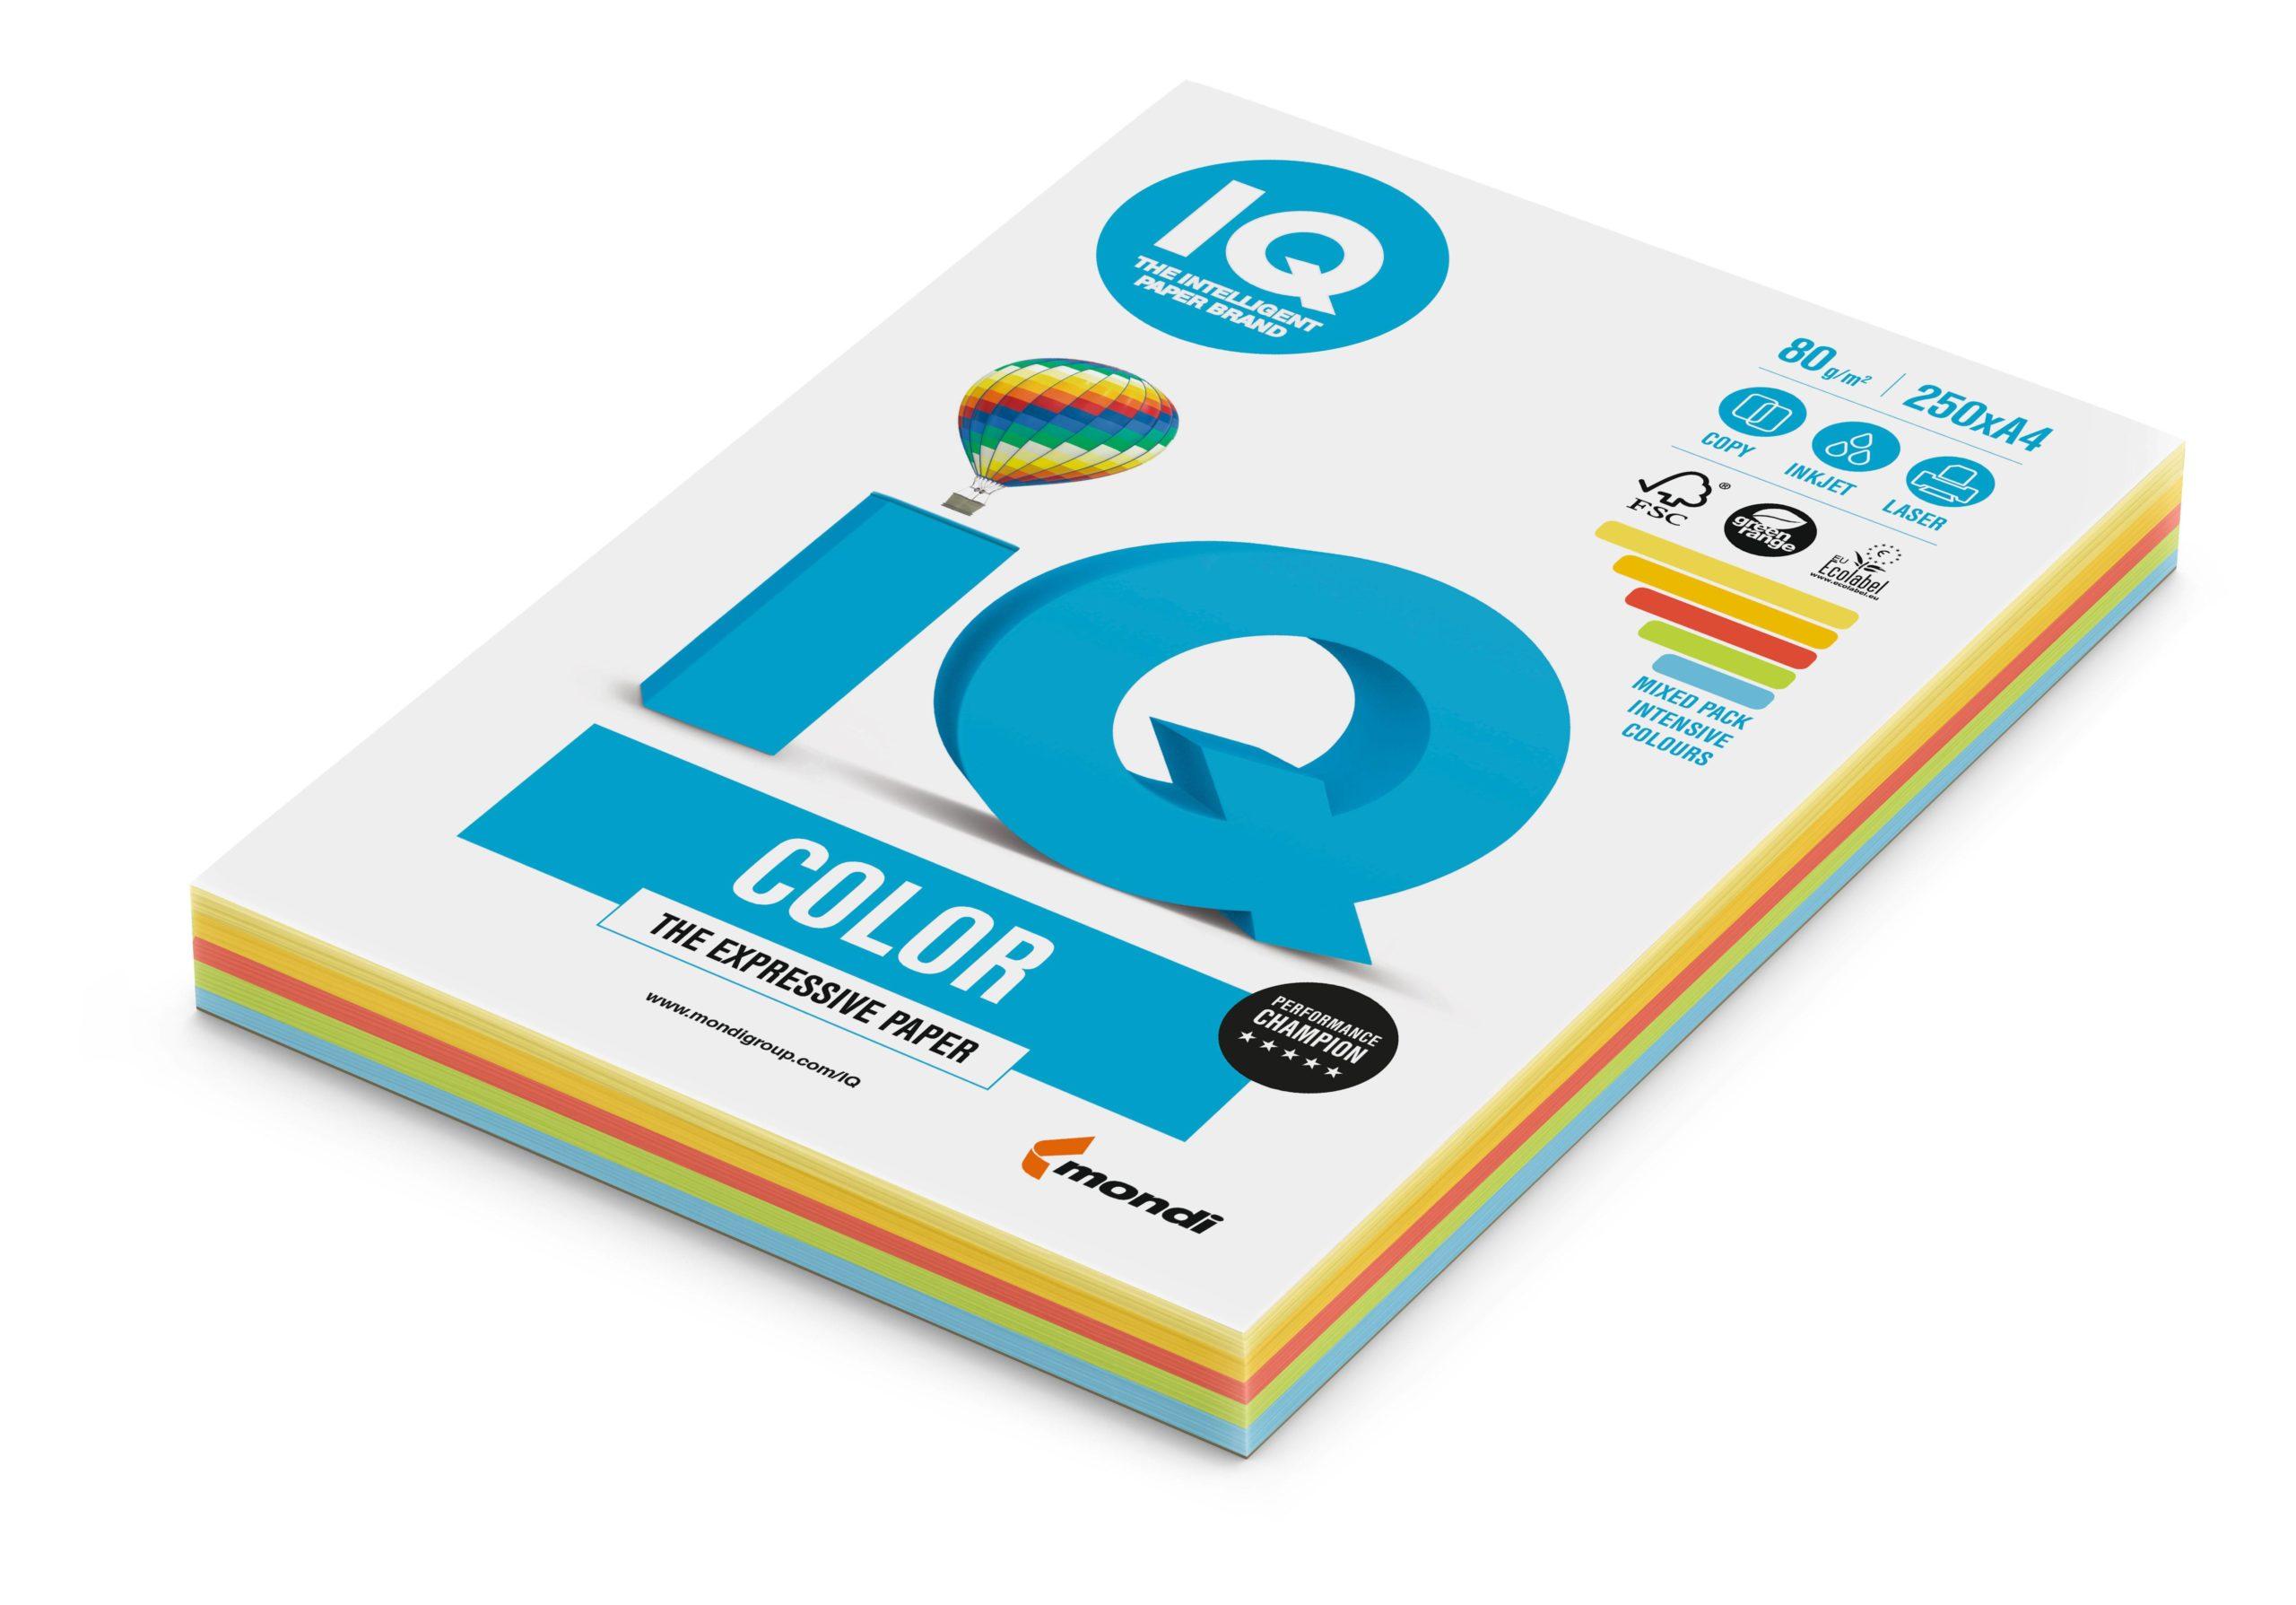 Бумага, А4, IQ COLOR MIX, 5цветов, 250 листов, 80 г/м2, интенсив